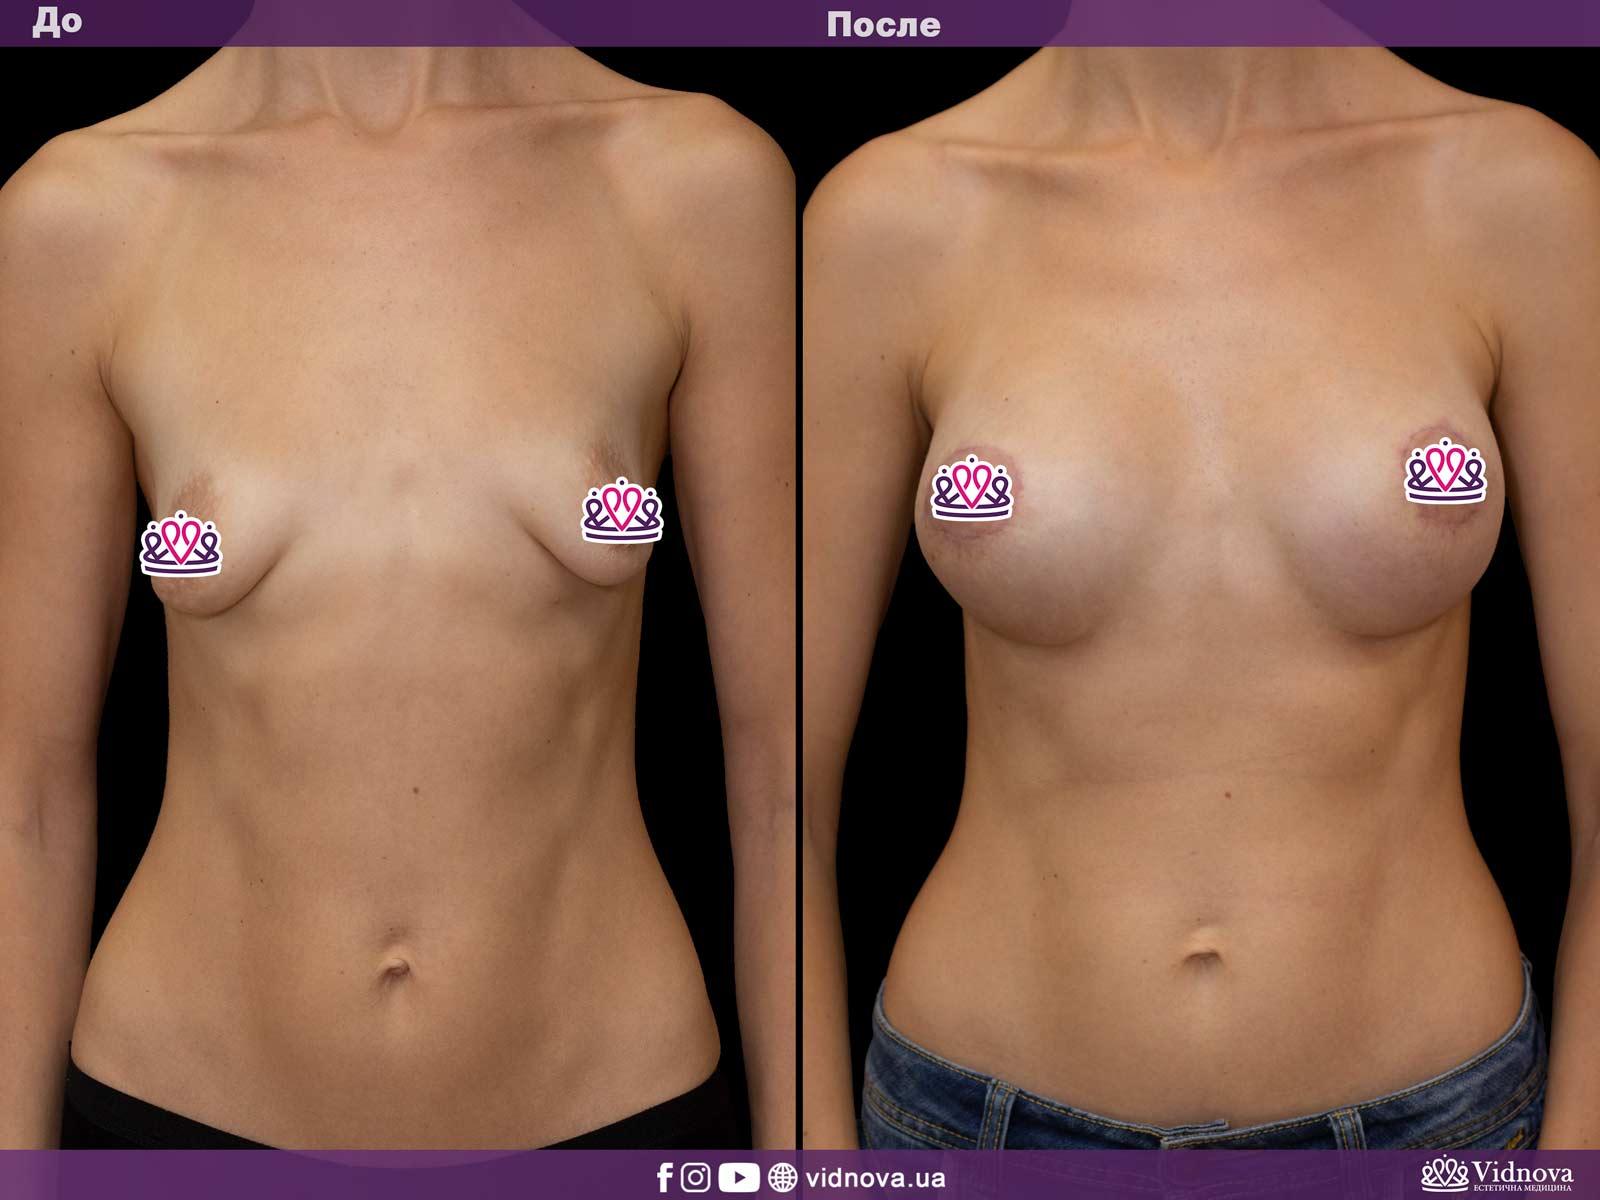 Подтяжка груди: Фото ДО и ПОСЛЕ - Пример №11-1 - Клиника Vidnova